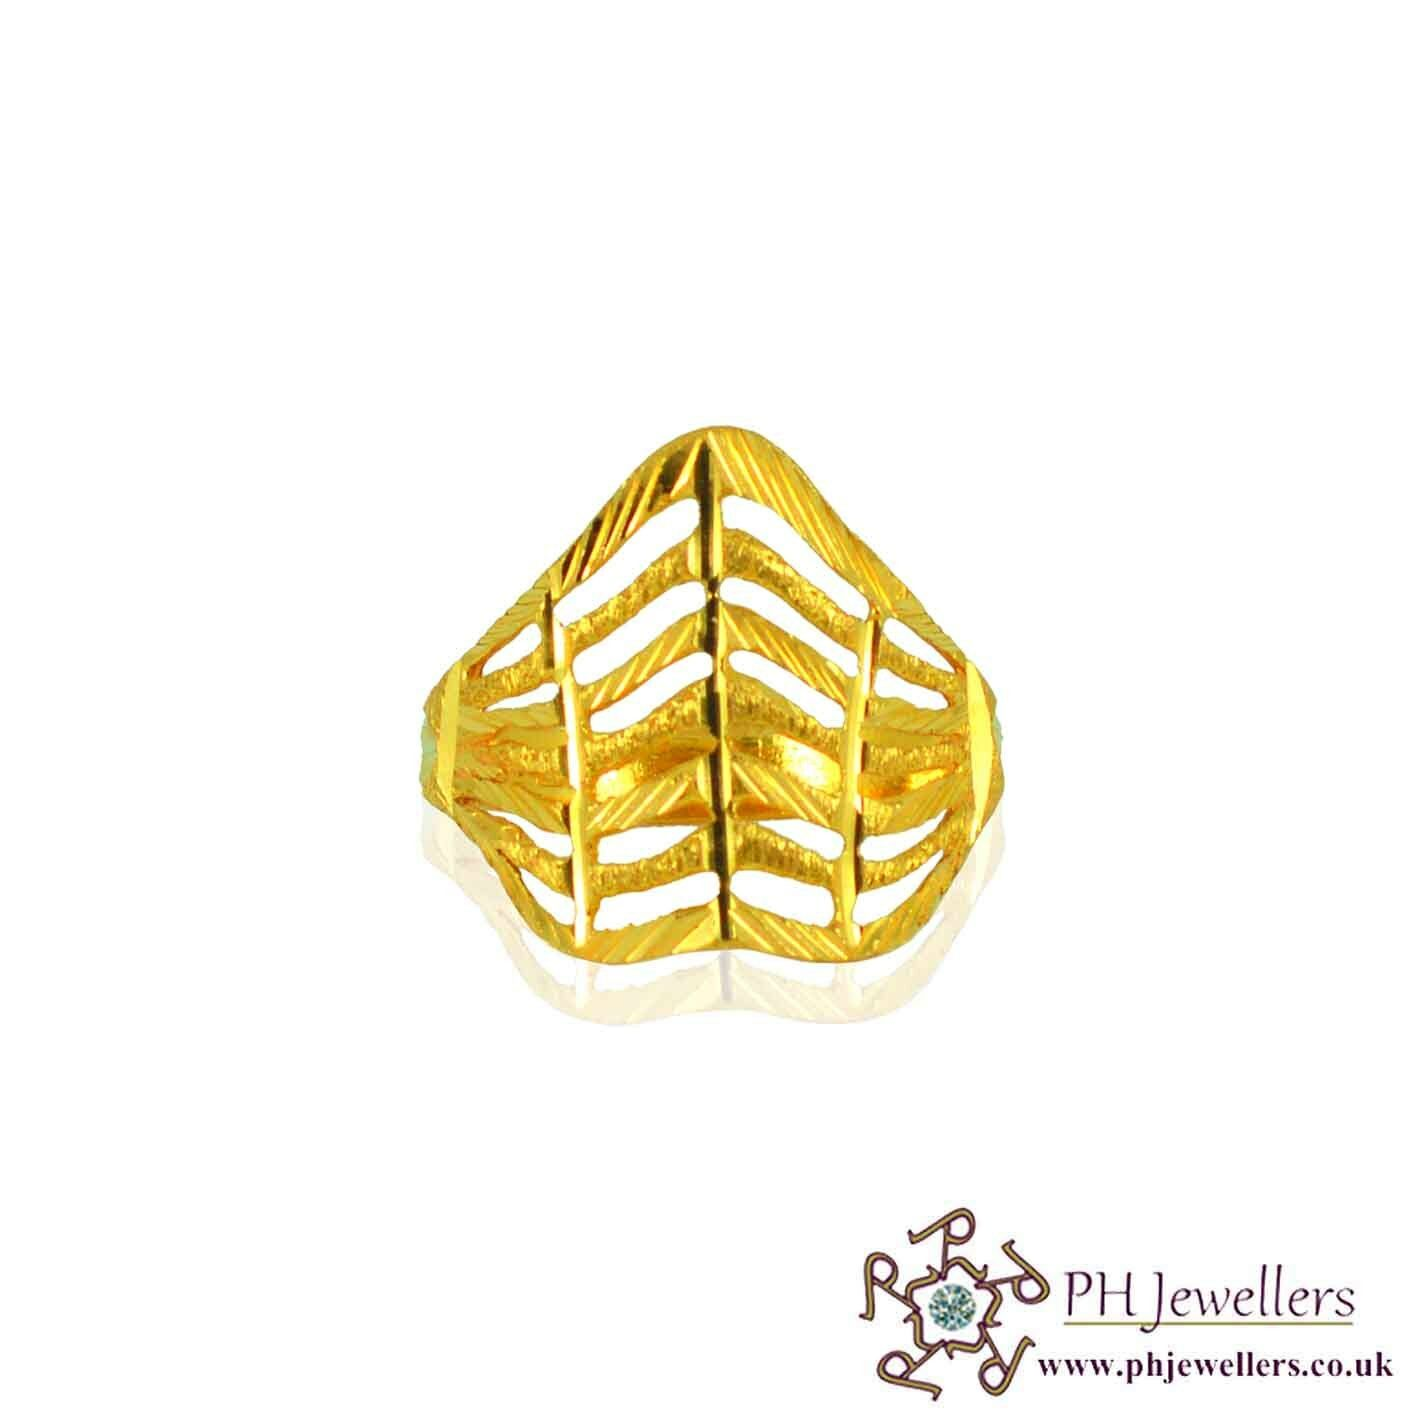 22ct 916 Hallmark Yellow gold Size O1 2,P,Q Ring FR5